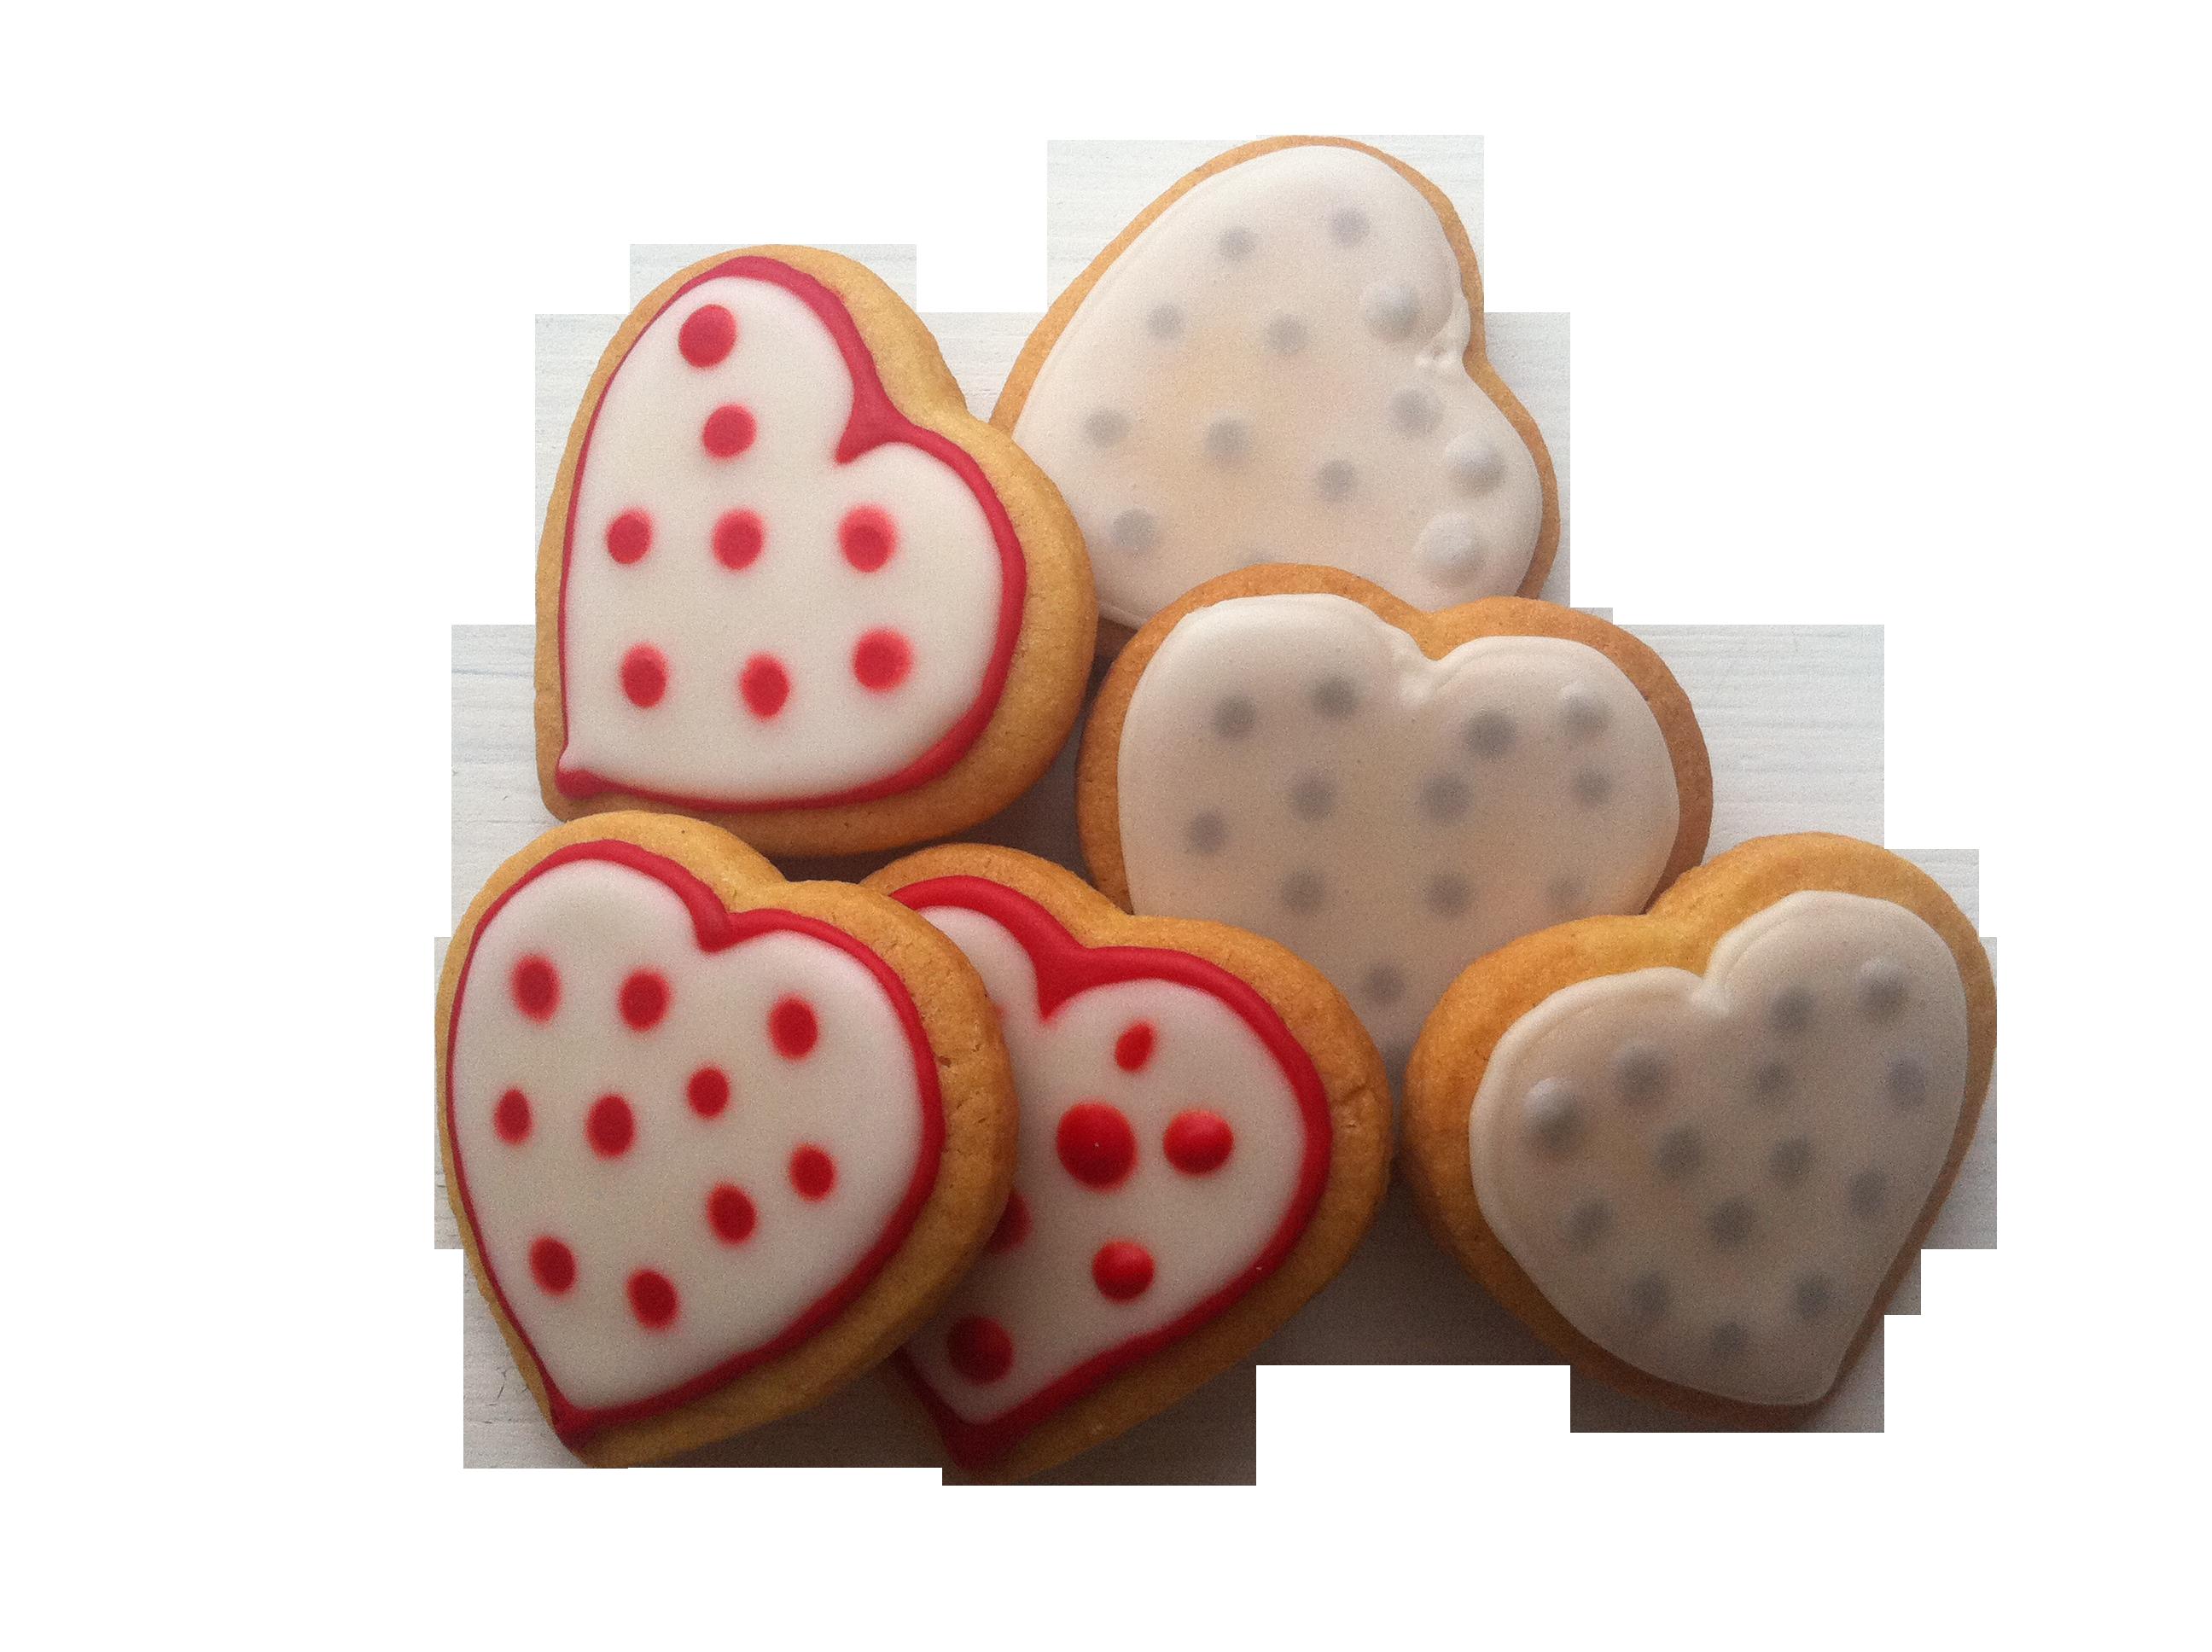 Heart Shaped Brown Cookies